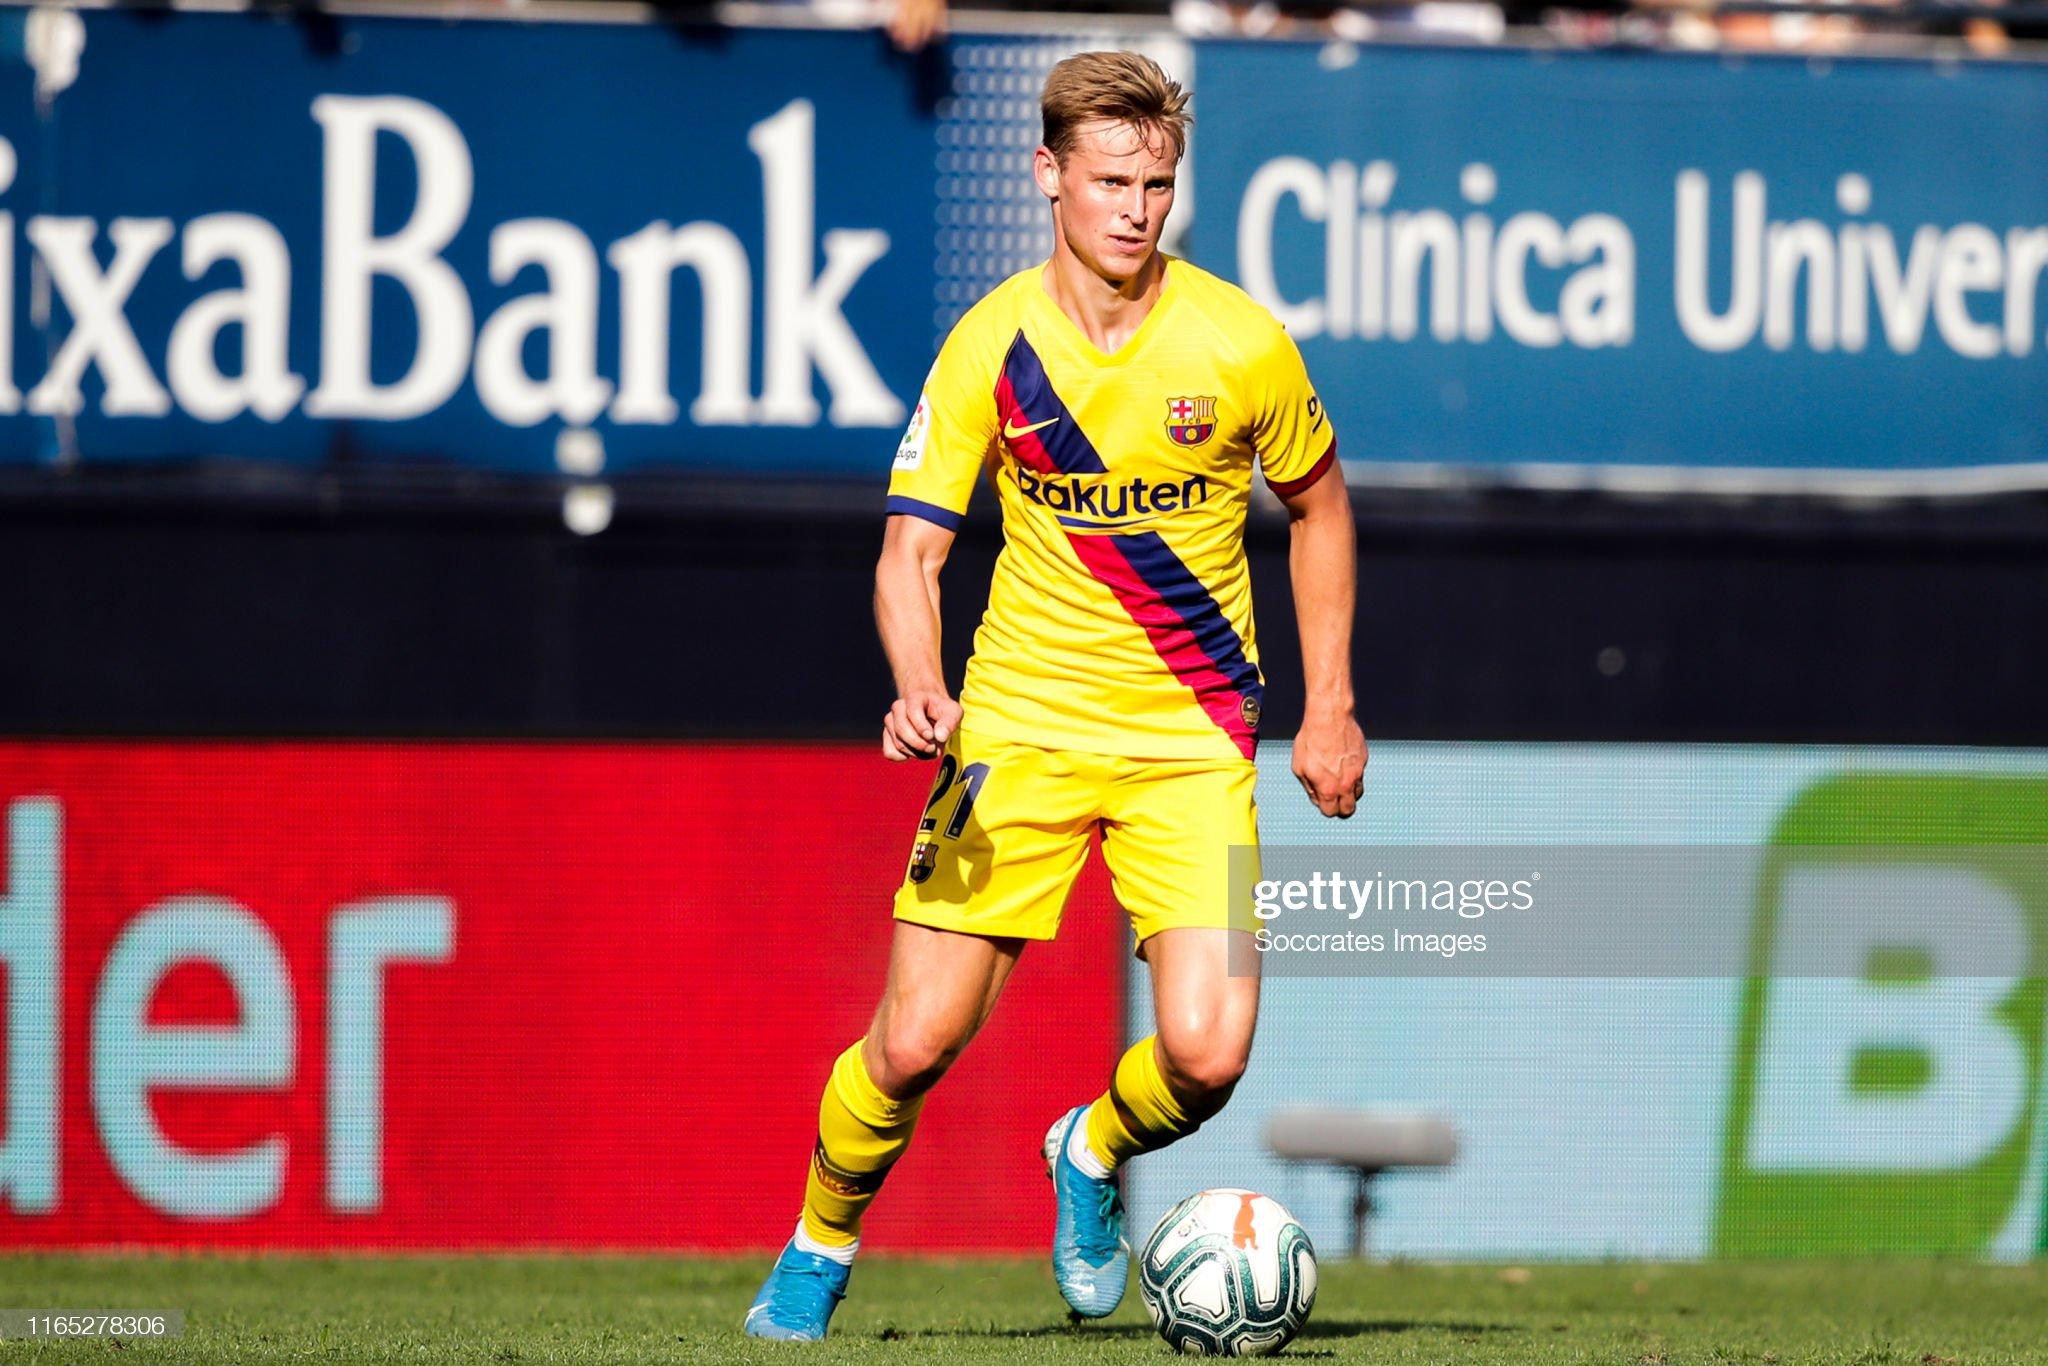 صور مباراة : أوساسونا - برشلونة 2-2 ( 31-08-2019 )  Frenkie-de-jong-of-fc-barcelona-during-the-la-liga-santander-match-picture-id1165278306?s=2048x2048